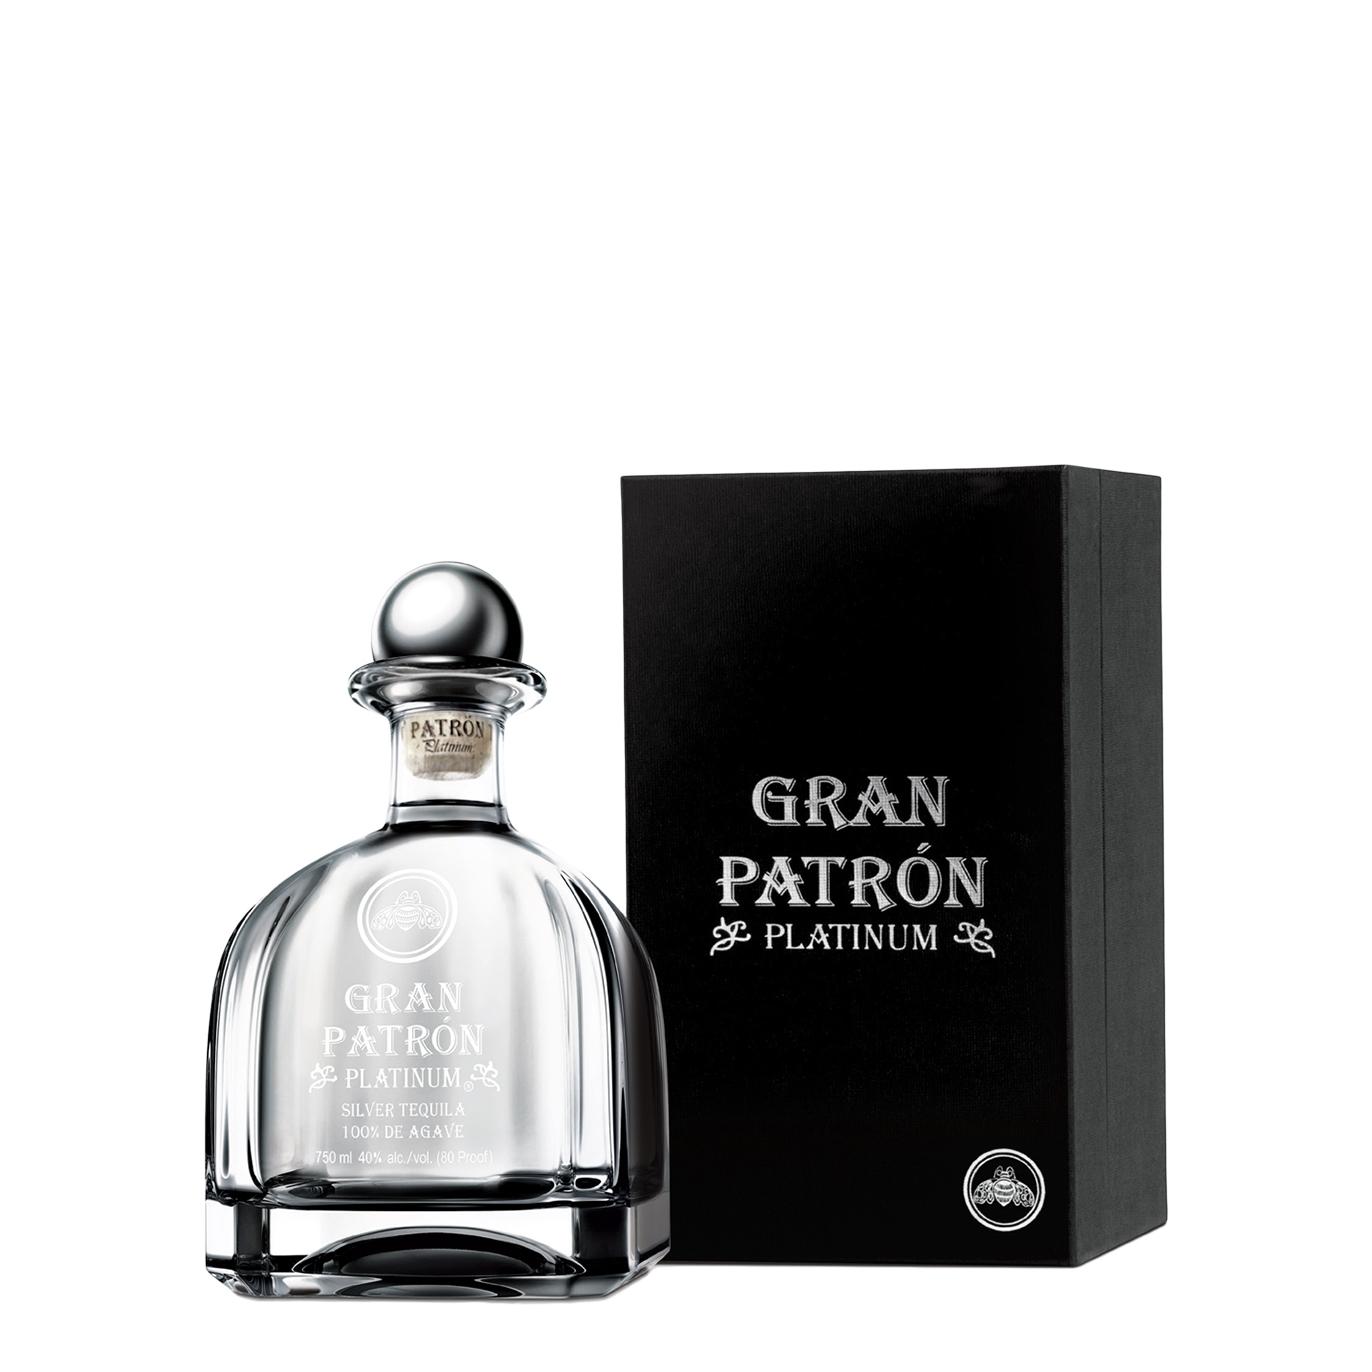 Patron Gran Patrón Platinum Silver Tequila - Harvey Nichols 2c3c832cf6b4